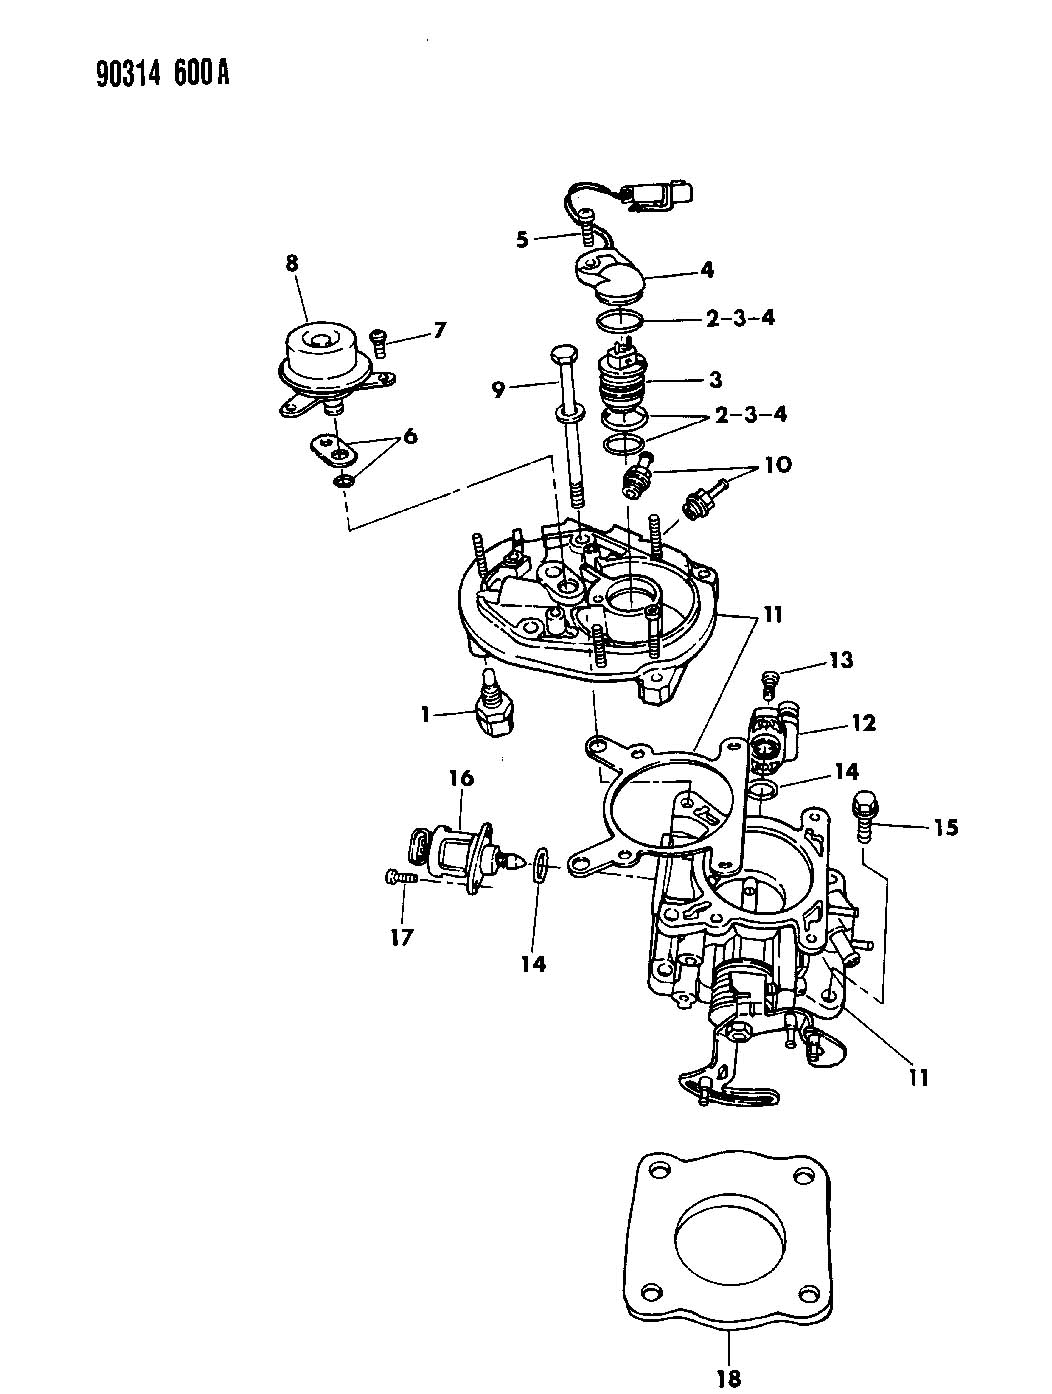 1992 dodge dakota throttle body 2 5l engine n body